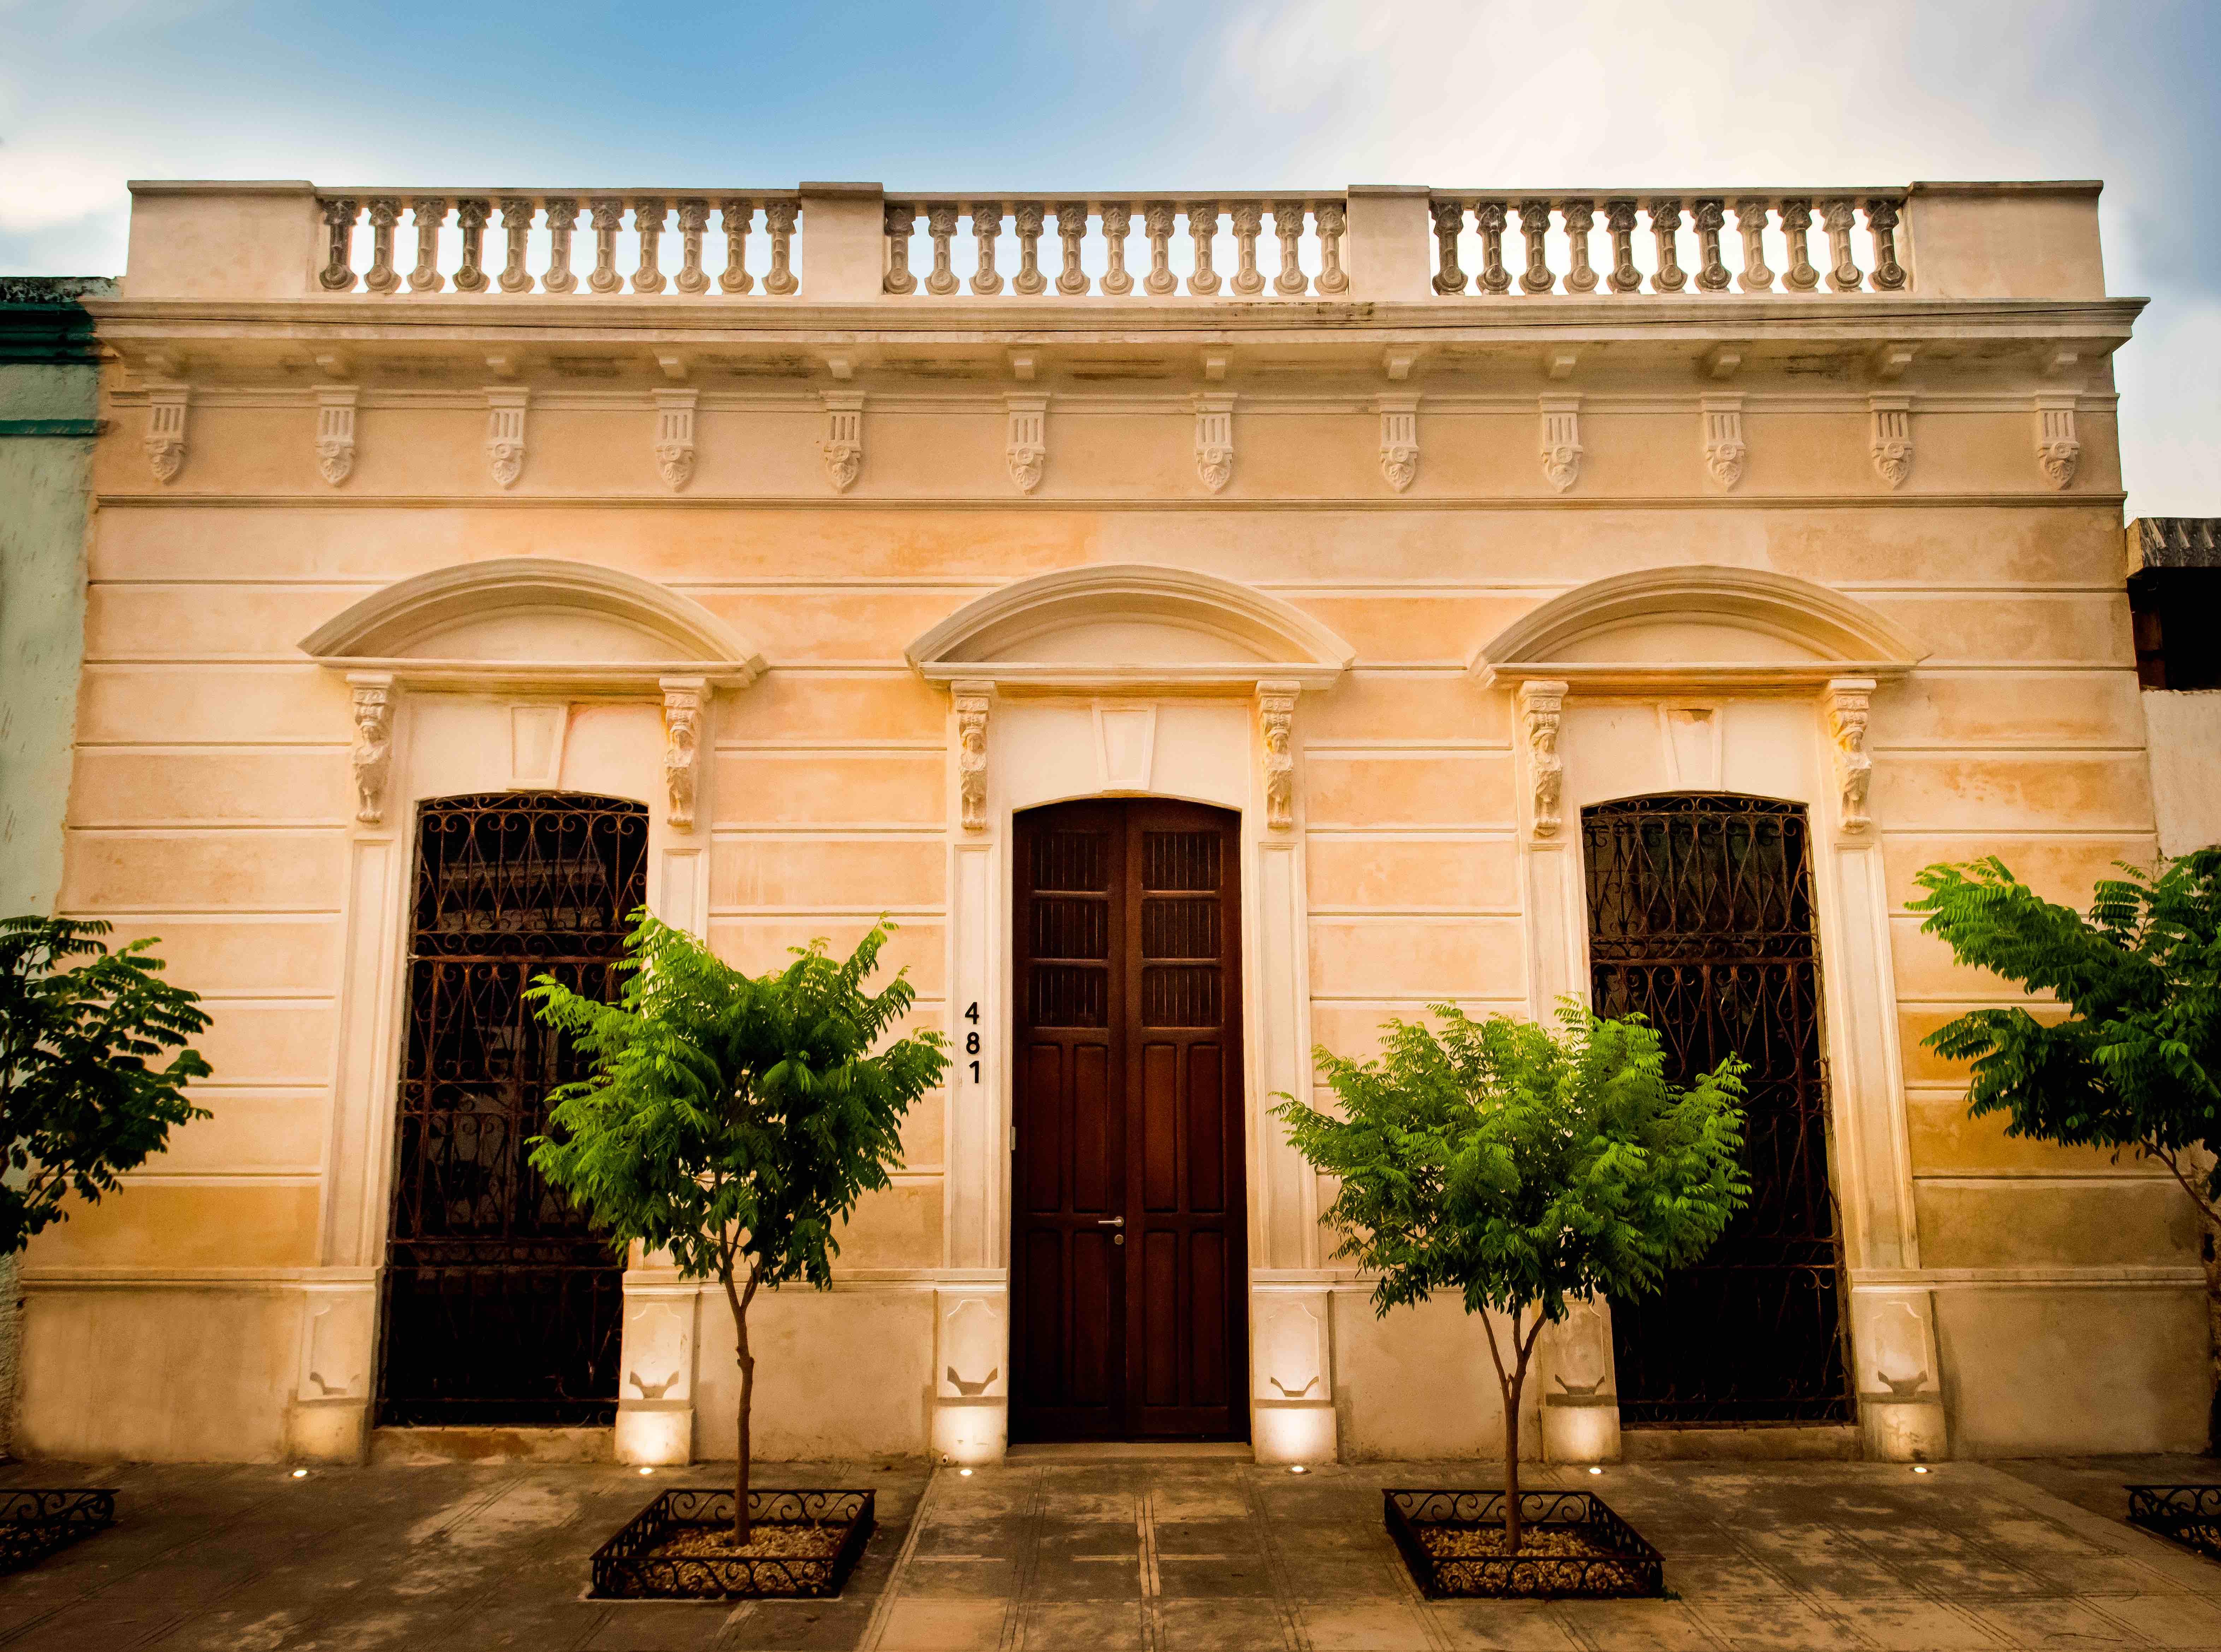 A Building Facade Characteristic Of Meridas Historic Center